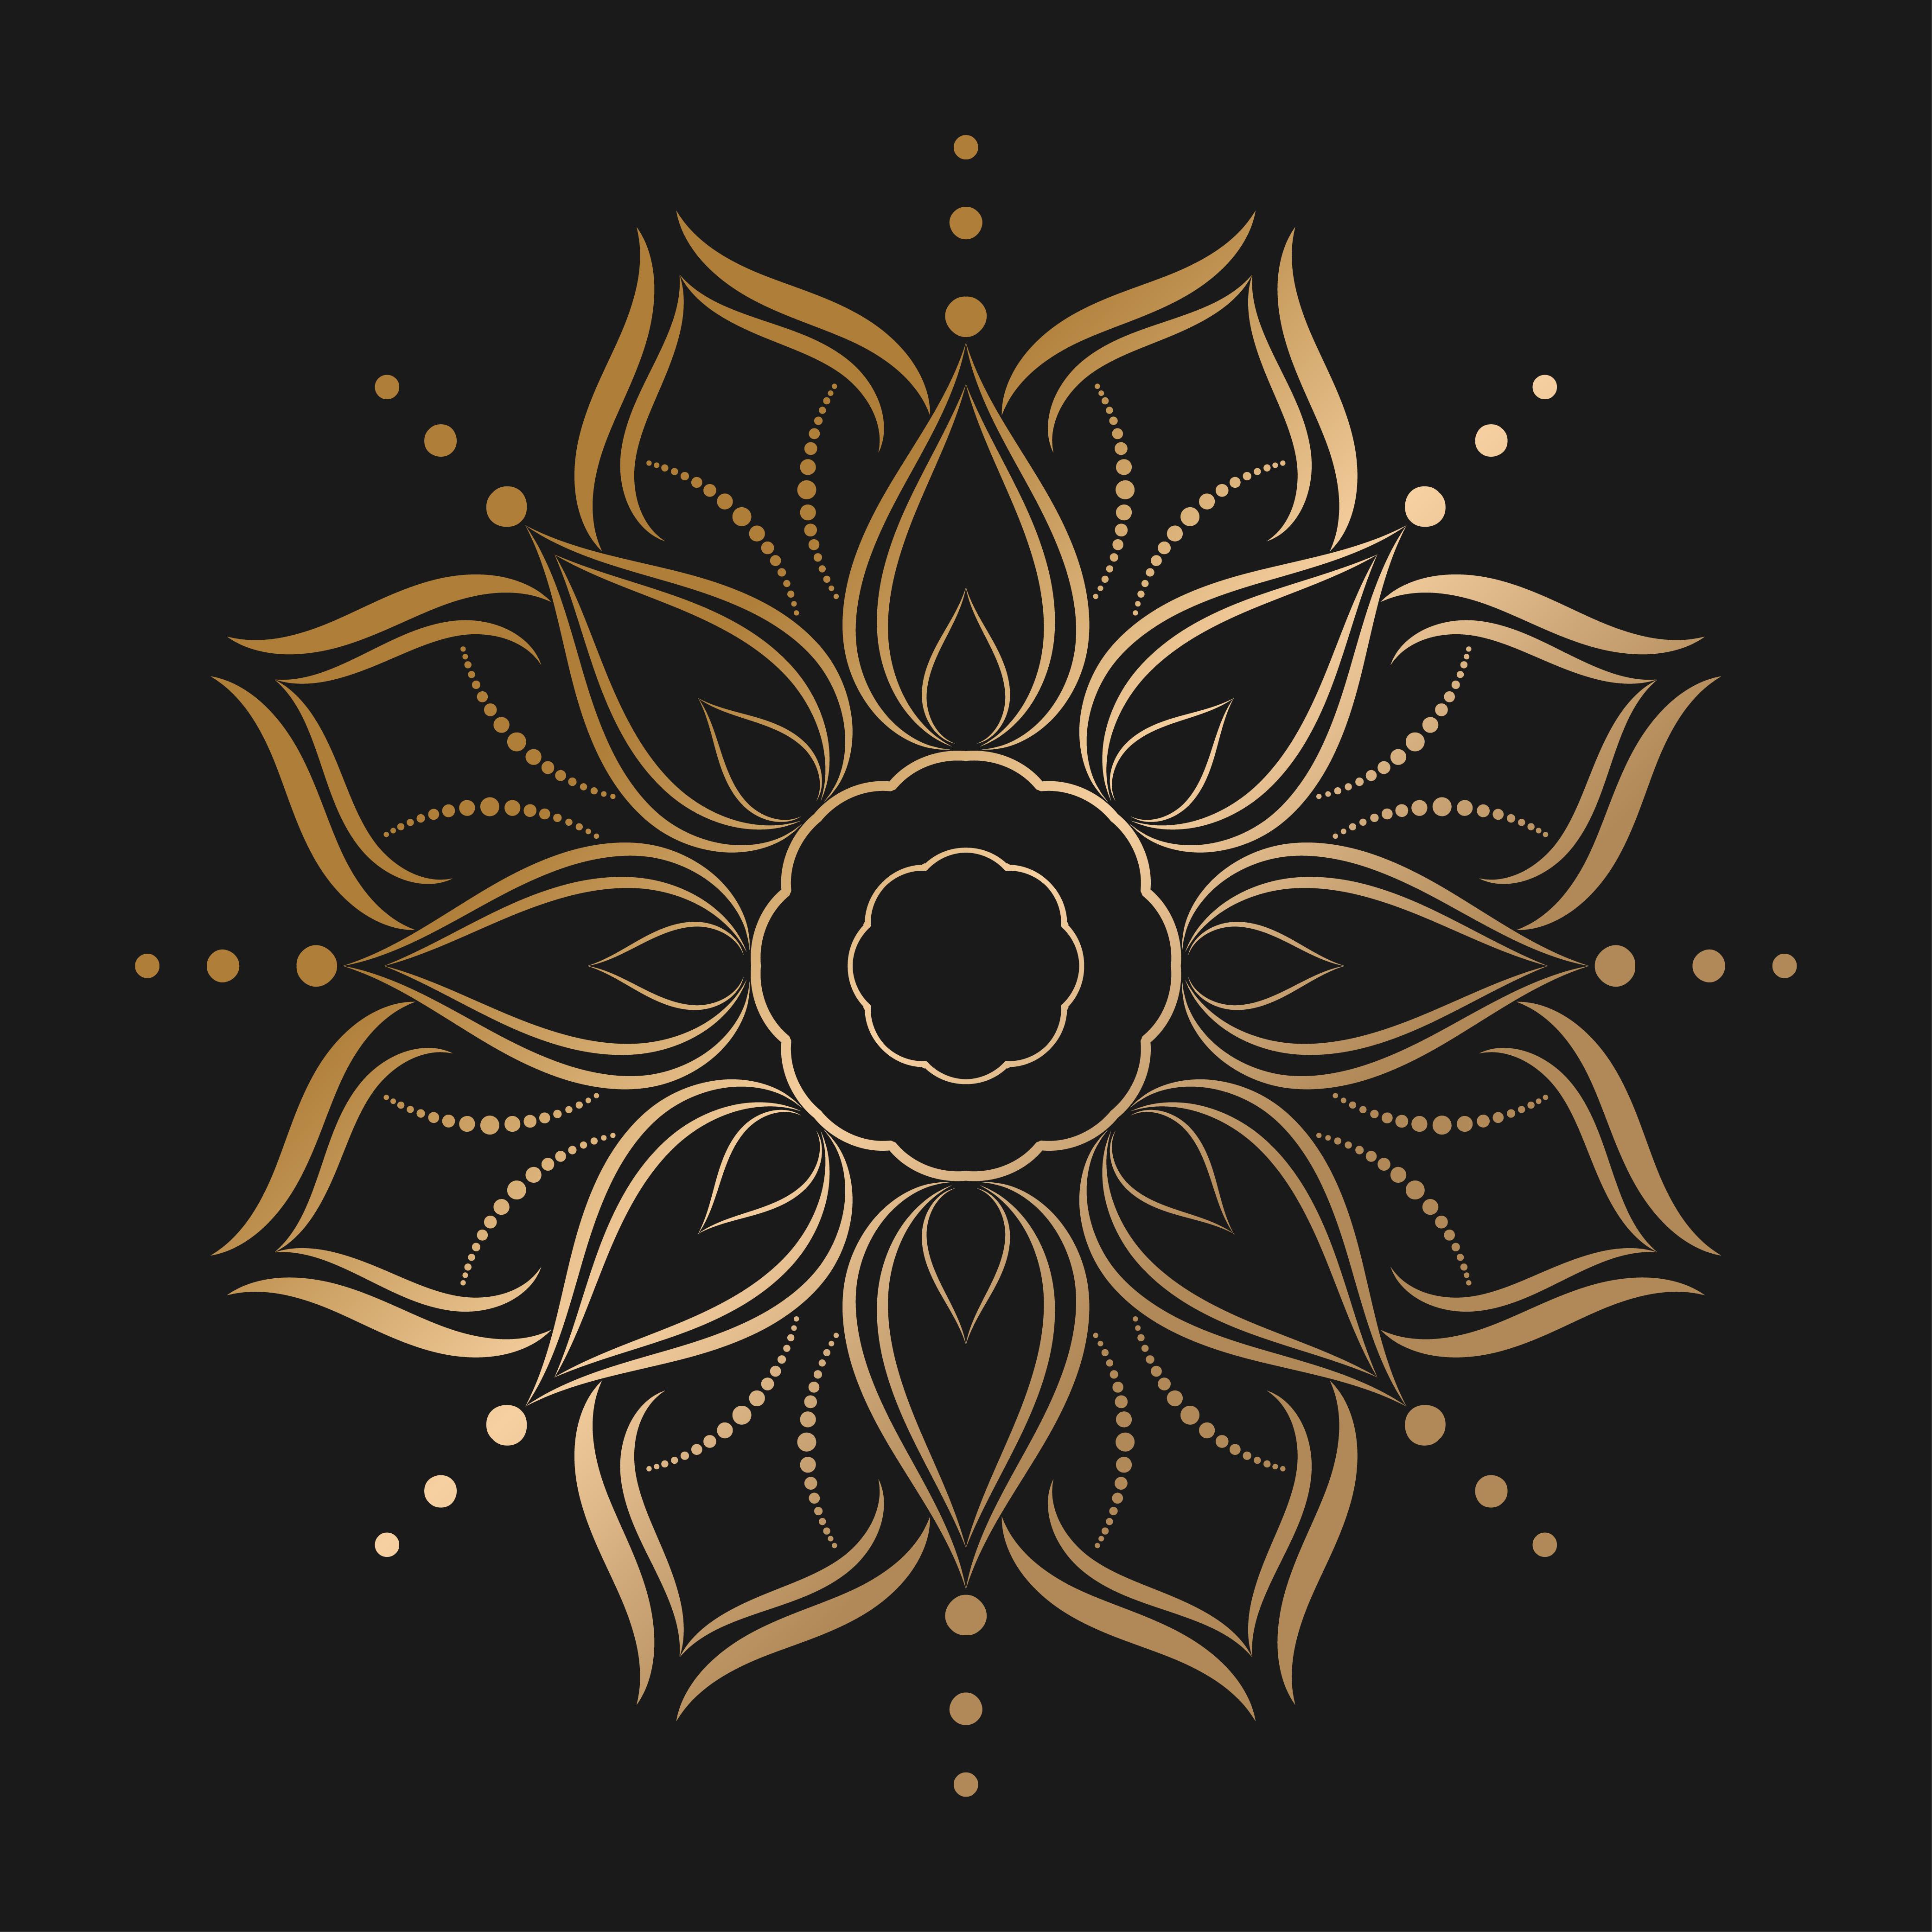 Gold mandala with flower style